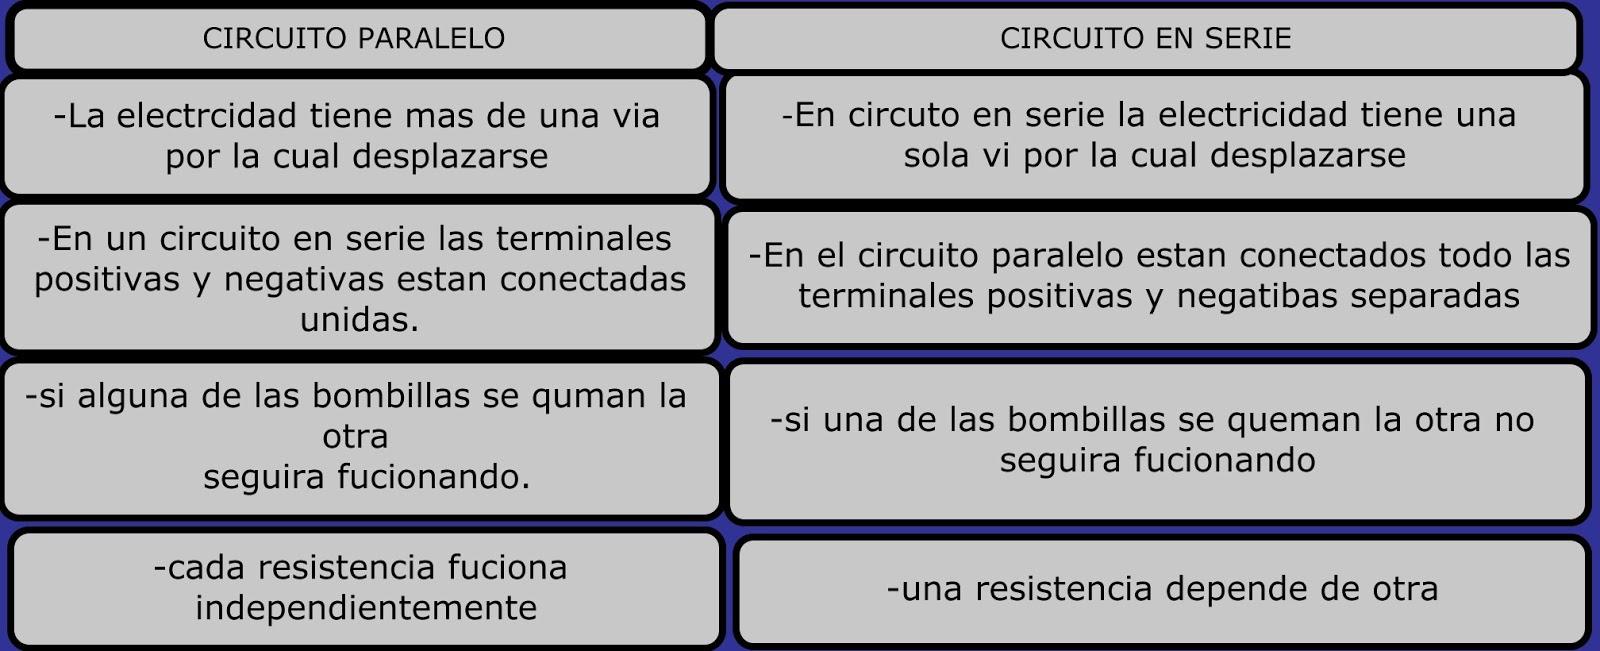 Circuito Seri E Paralelo : Tecnologia e informatica circuitos y la ley de ohm